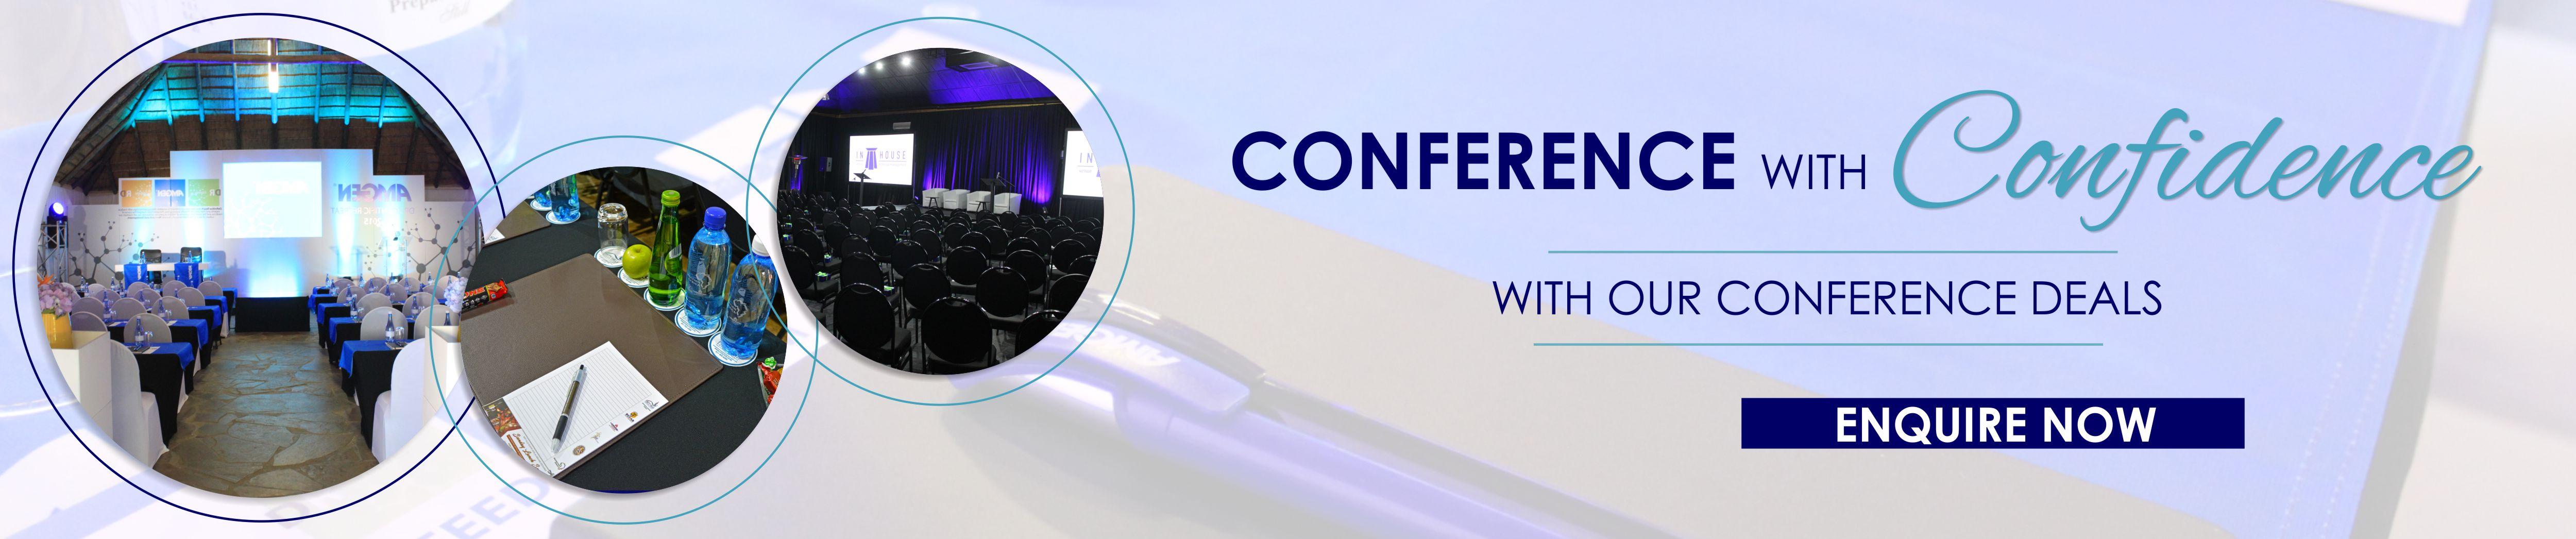 Misty Hills Conference Deals 2021